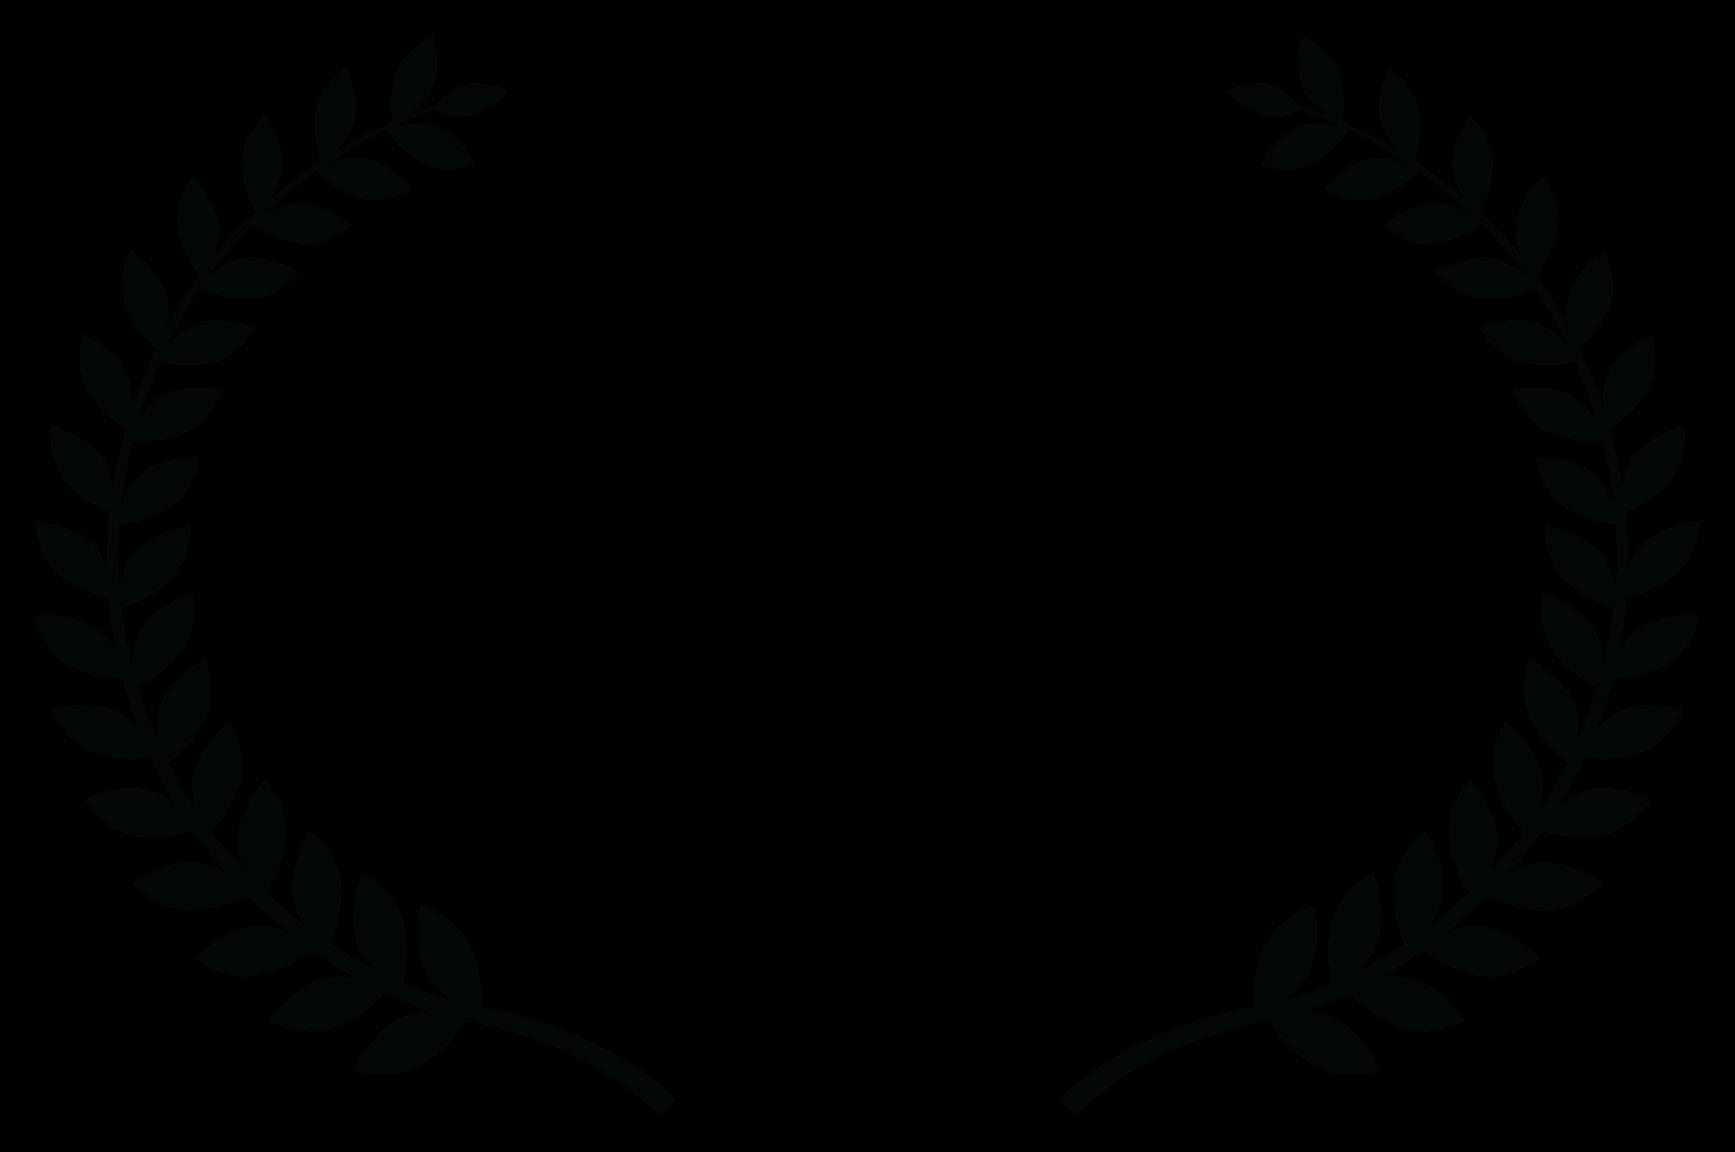 OFFICIAL SELECTION - London International Filmmaker Festival Of World Cinema - 2019-2.png